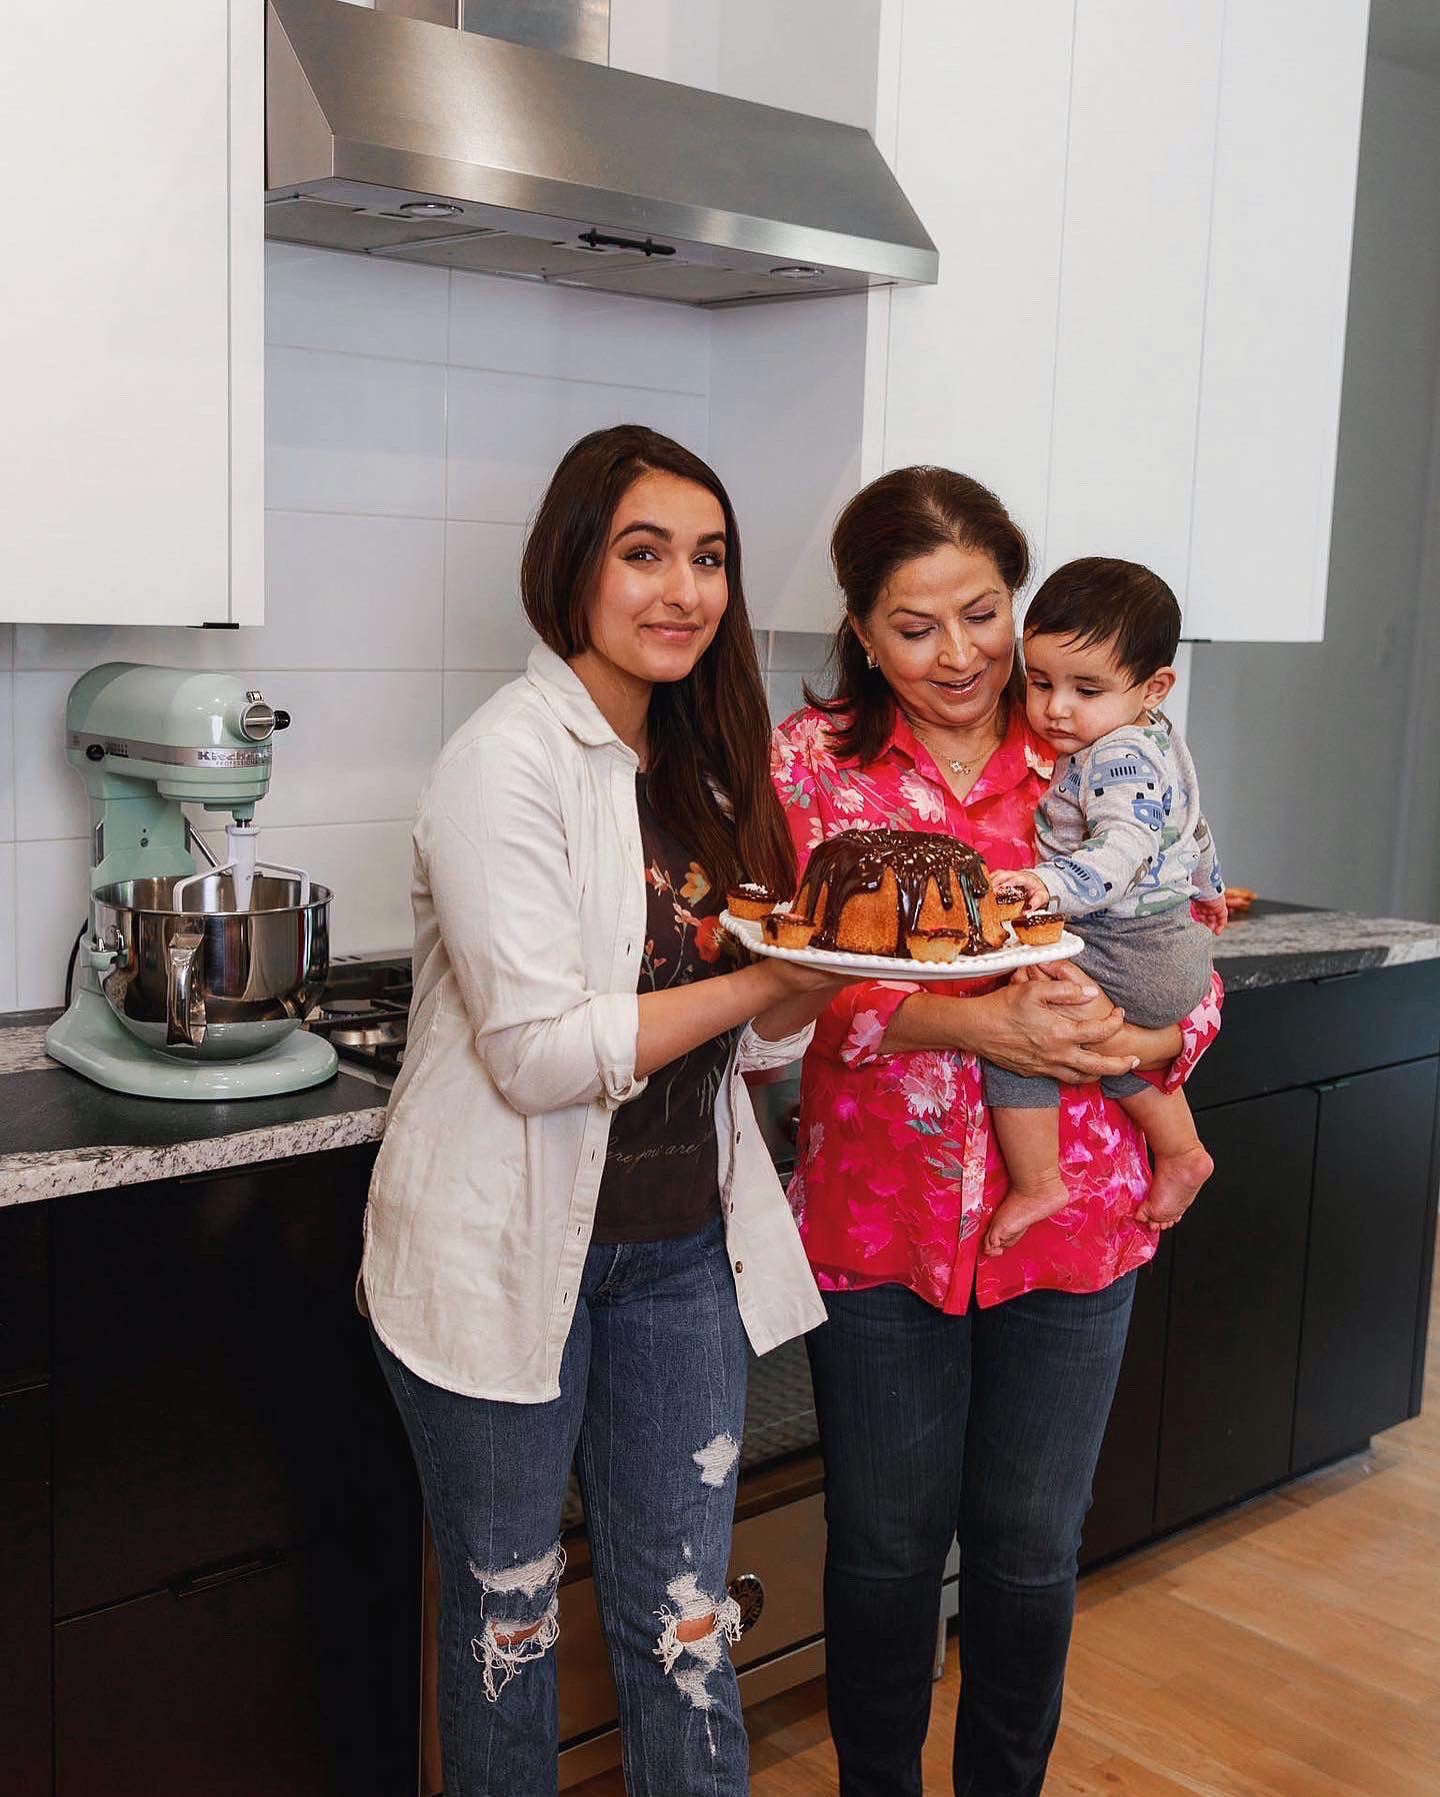 Nita Mann shares her mom's vanilla cake recipe